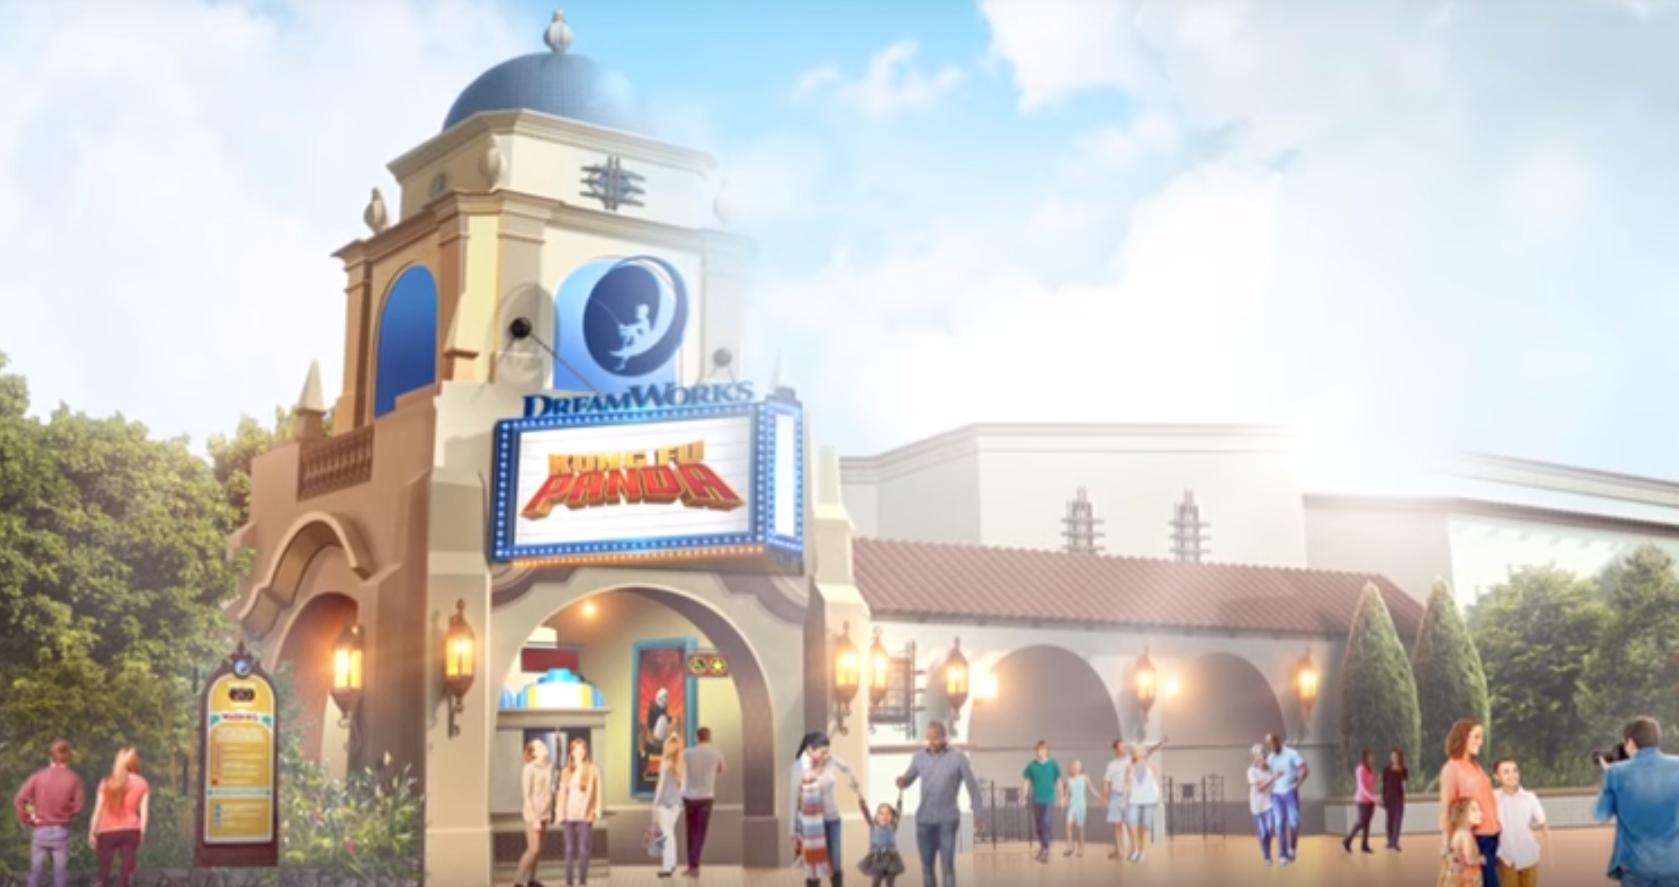 DreamWorks Animation Theatre concept art